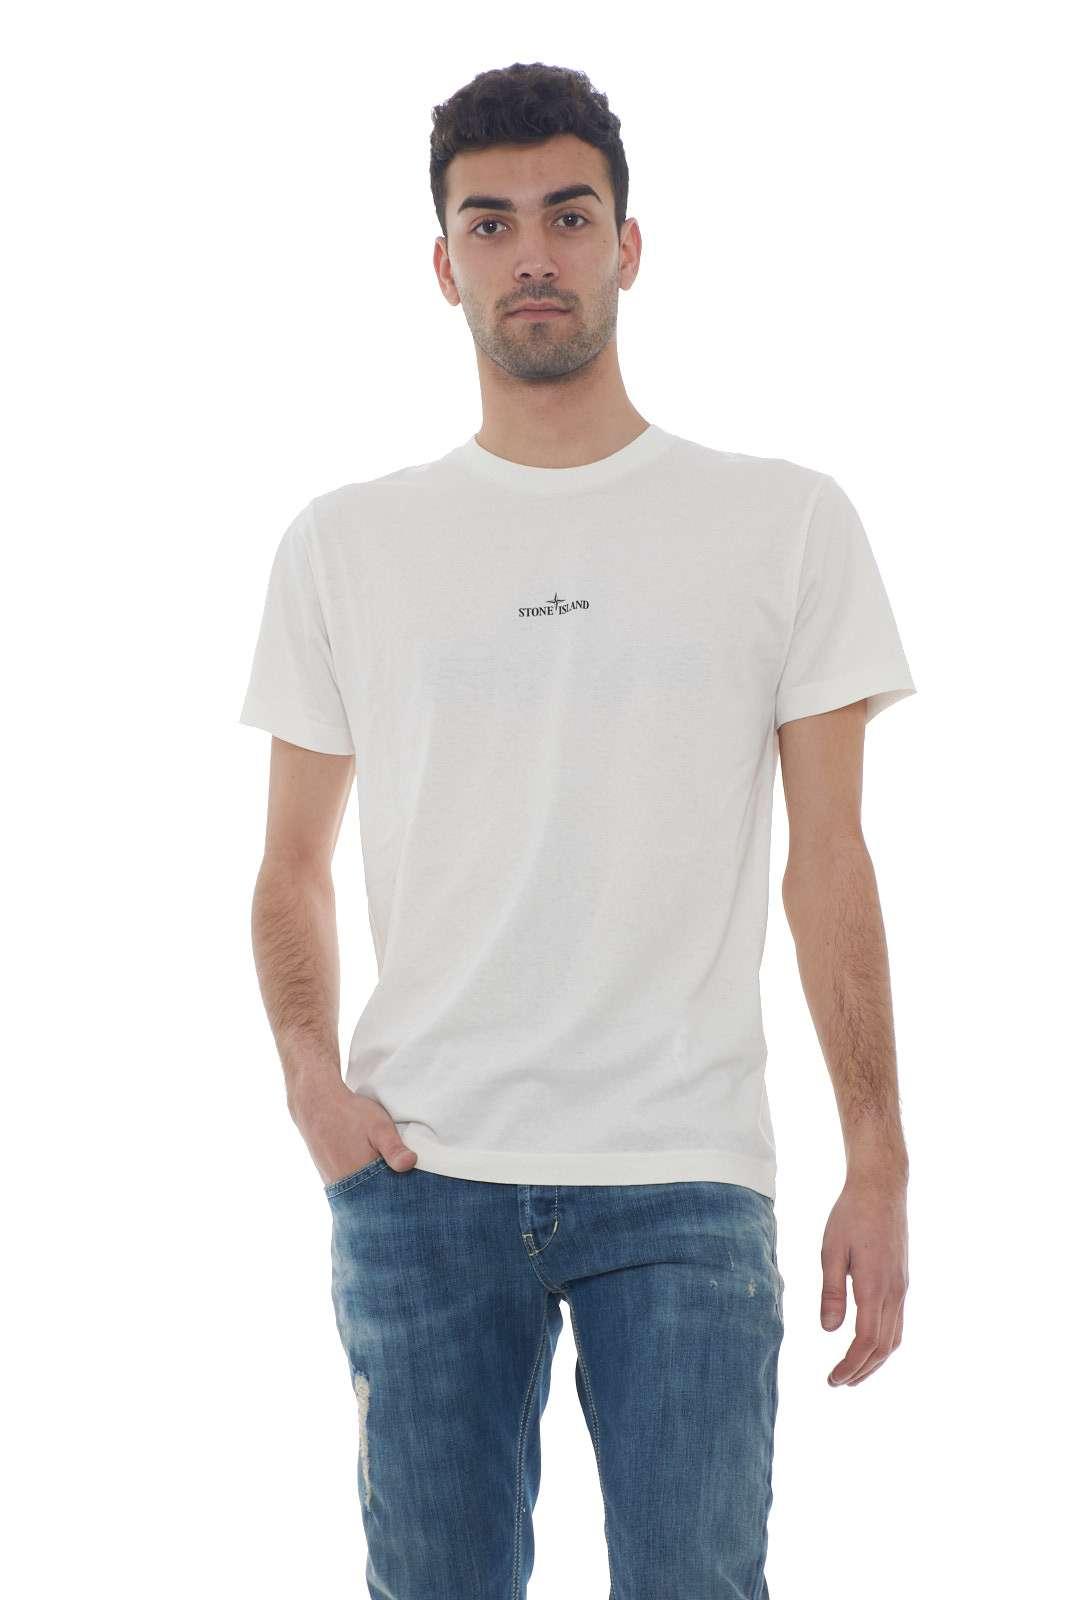 https://www.parmax.com/media/catalog/product/a/i/PE-outlet_parmax-t-shirt-uomo-Stone-Island-72152ns84-A.jpg